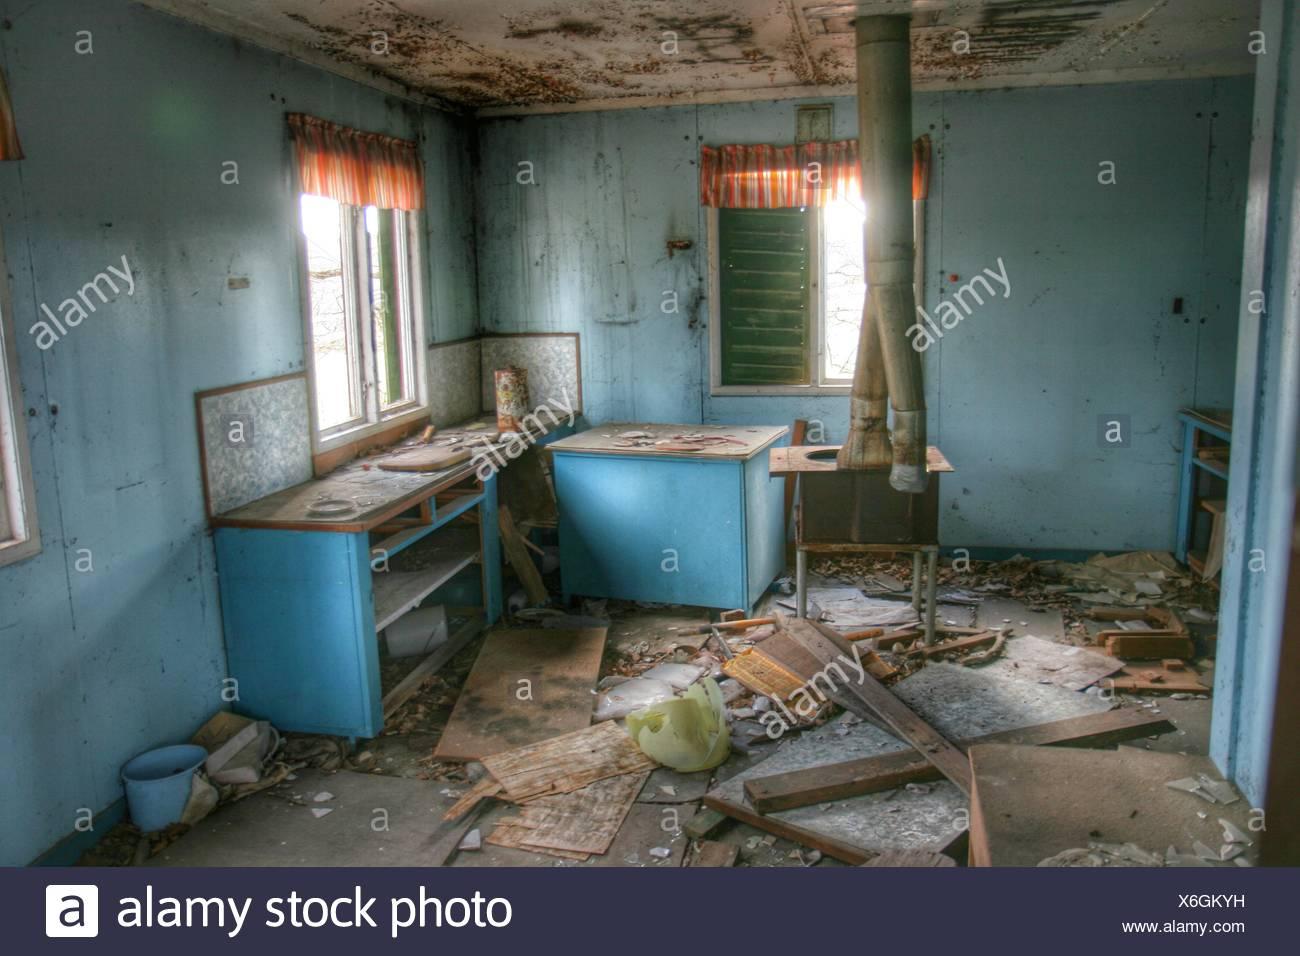 Messy Abandoned House - Stock Image